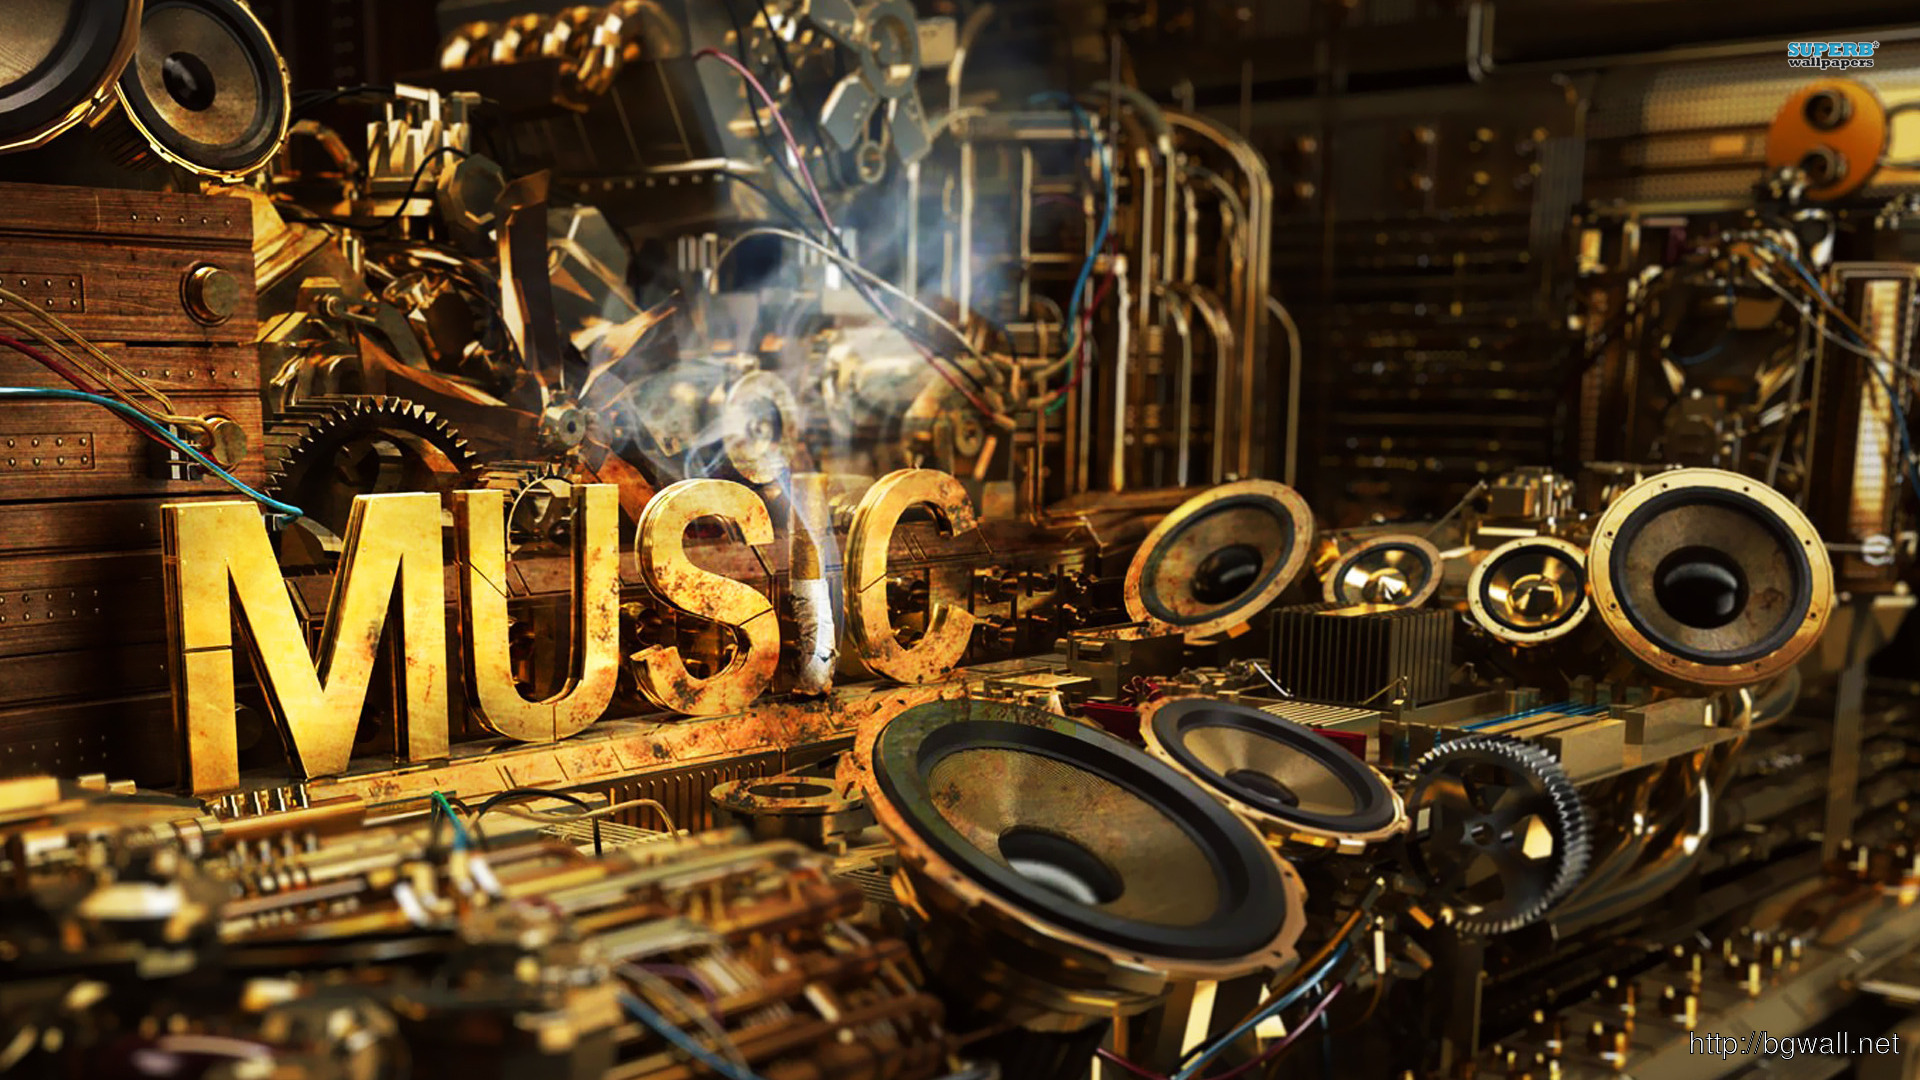 Music wallpaper background wallpaper hd music wallpaper voltagebd Gallery